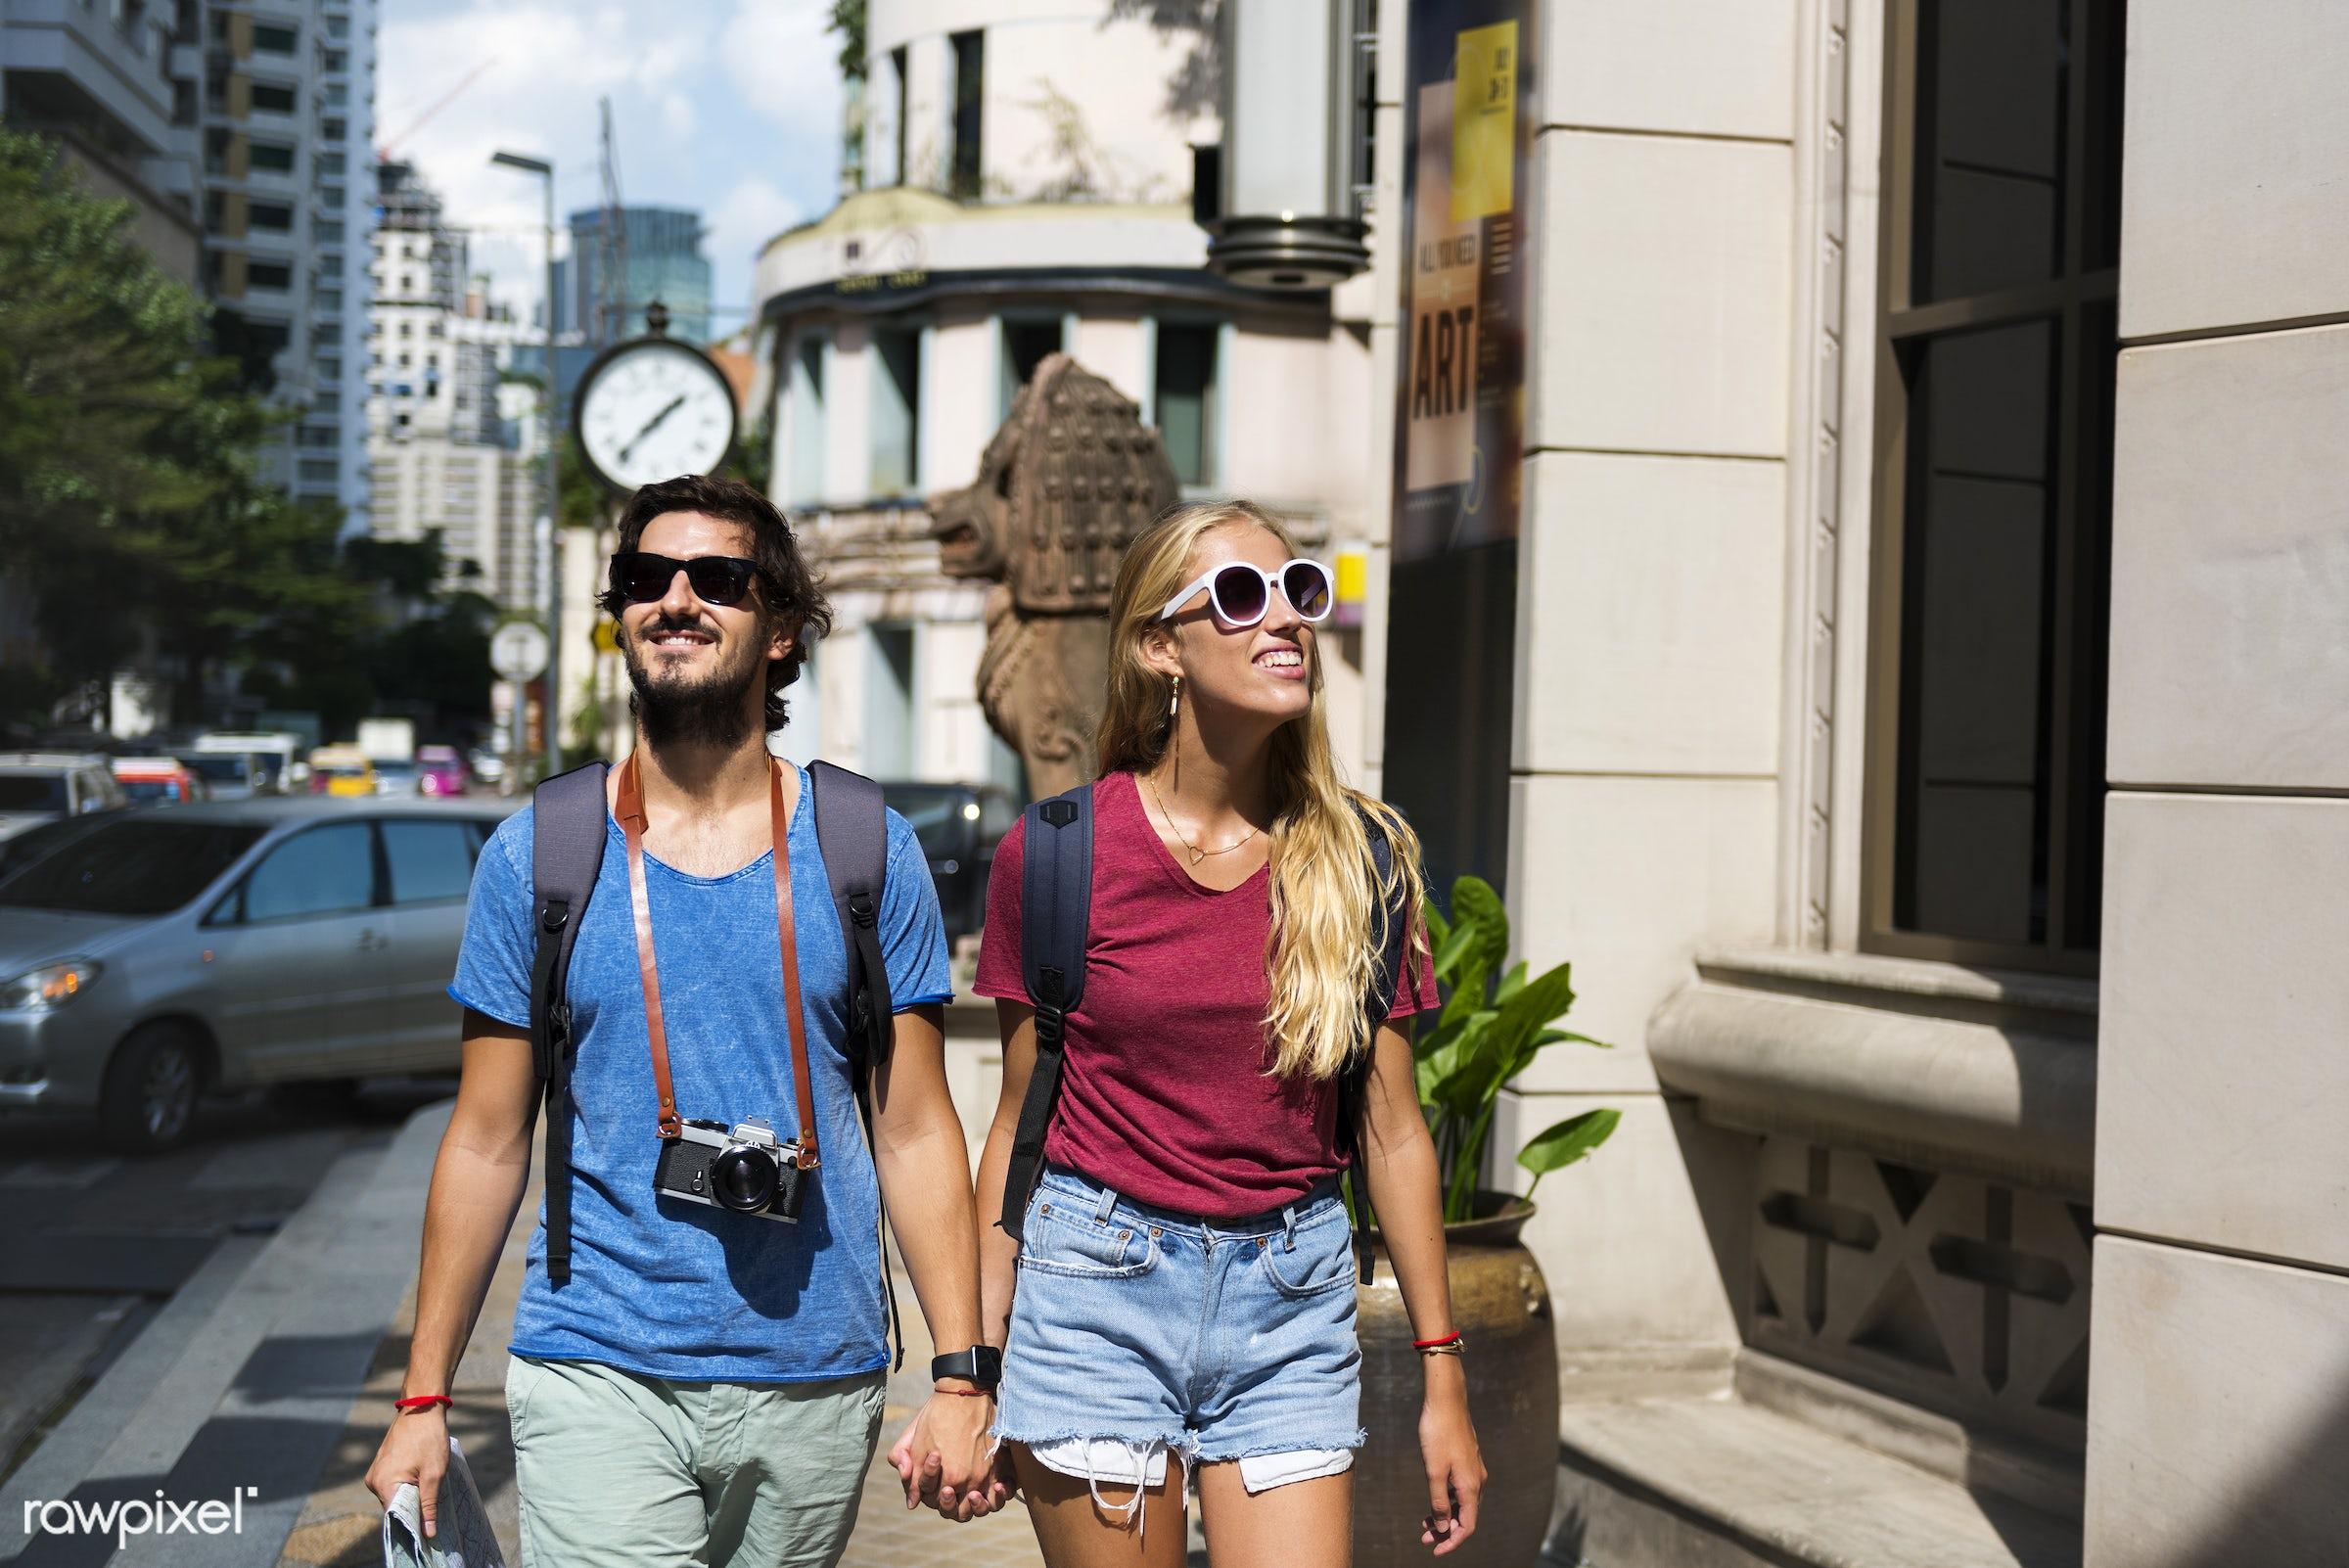 metropolis, holding, backpackers, travel, people, together, wanderlust, city, center, woman, buildings, partner, smile,...